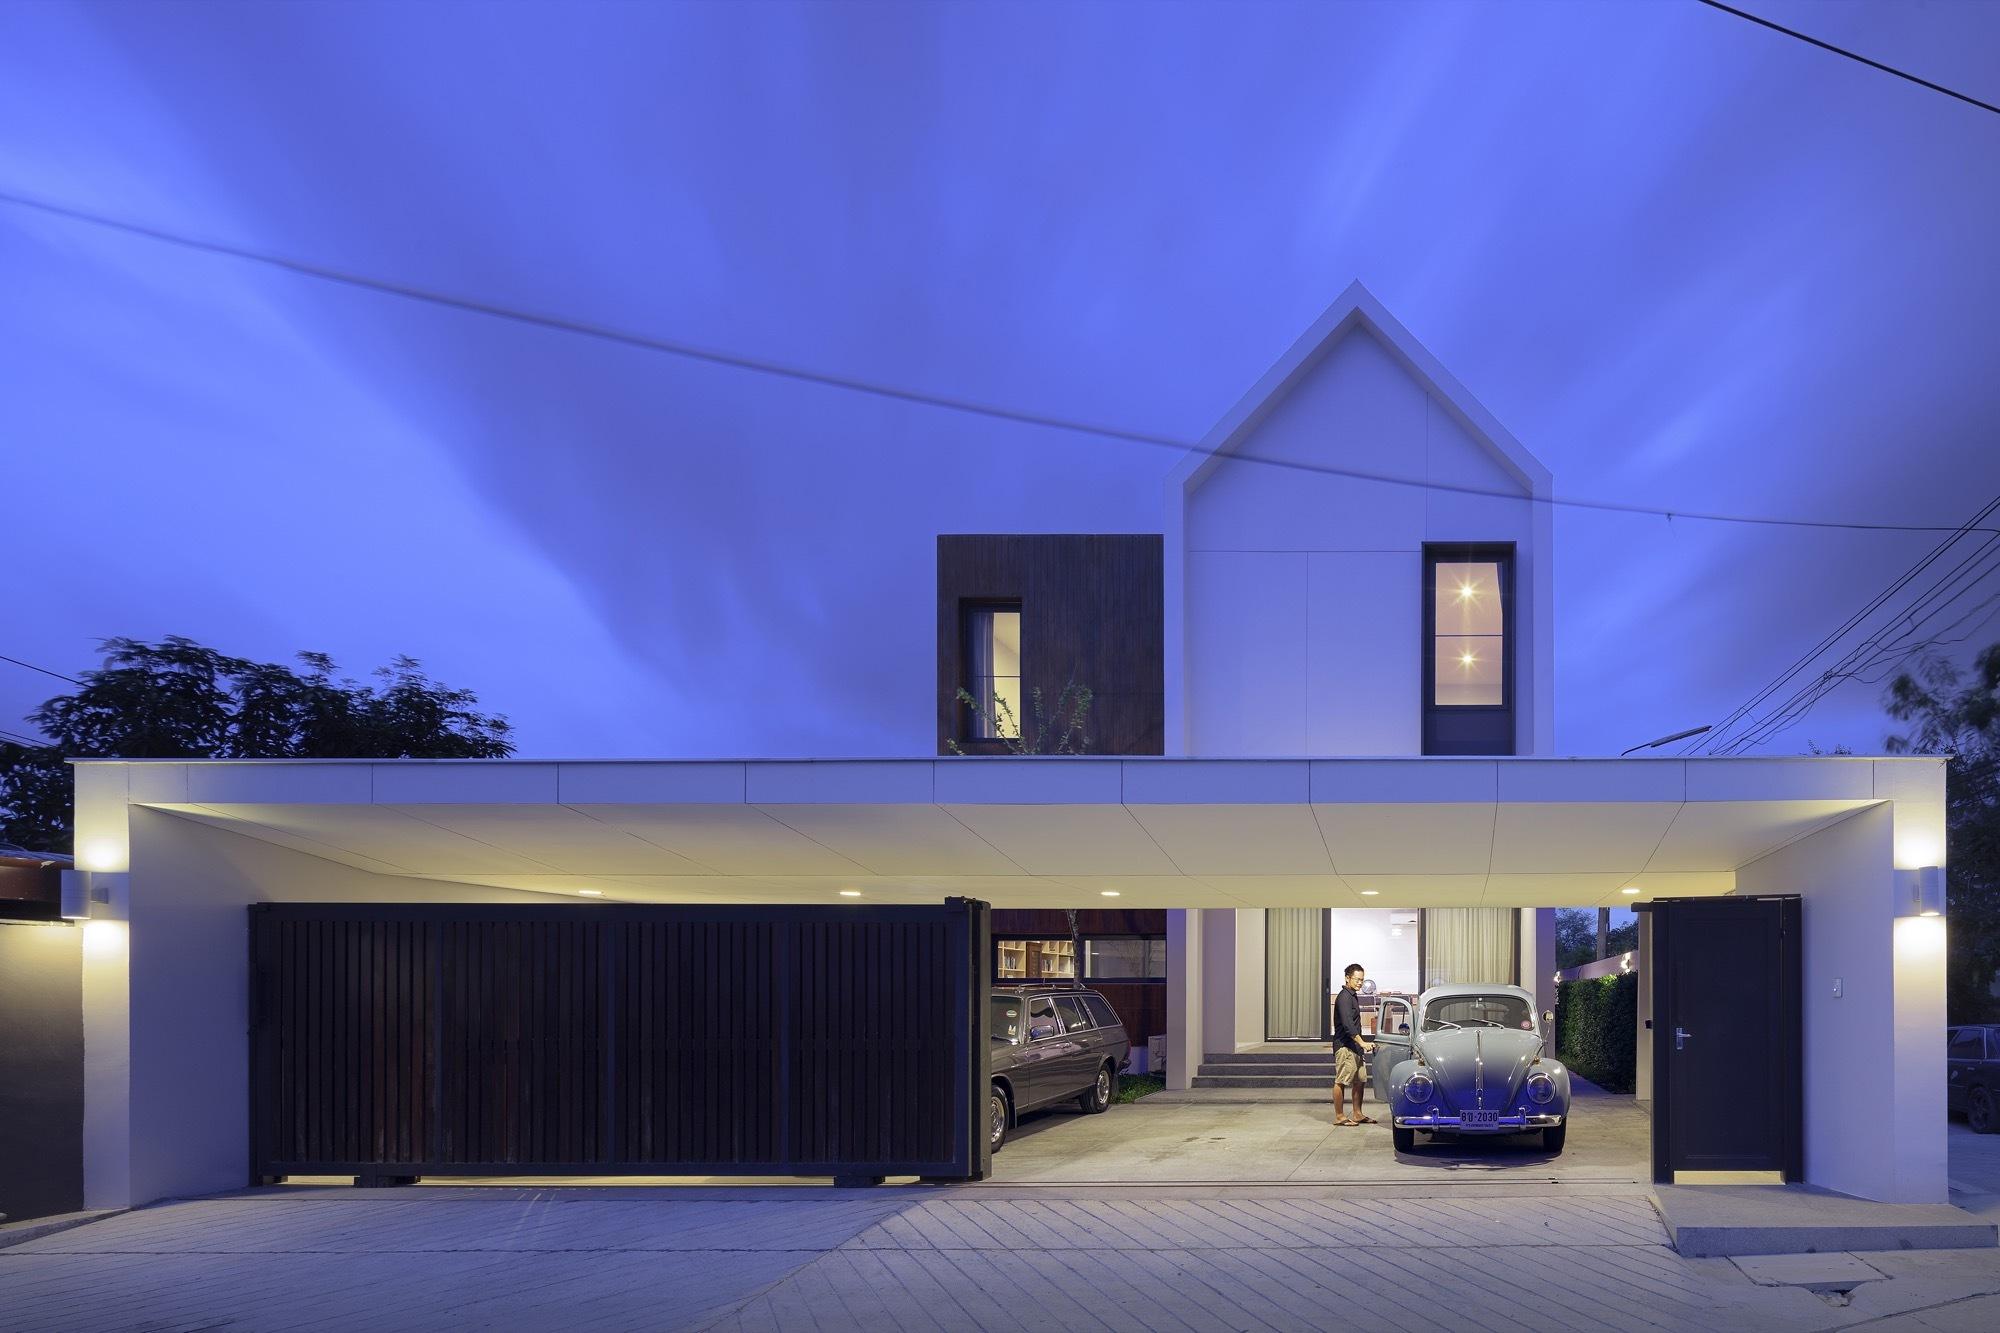 Casa Nawamin 24 / I Like Design Studio